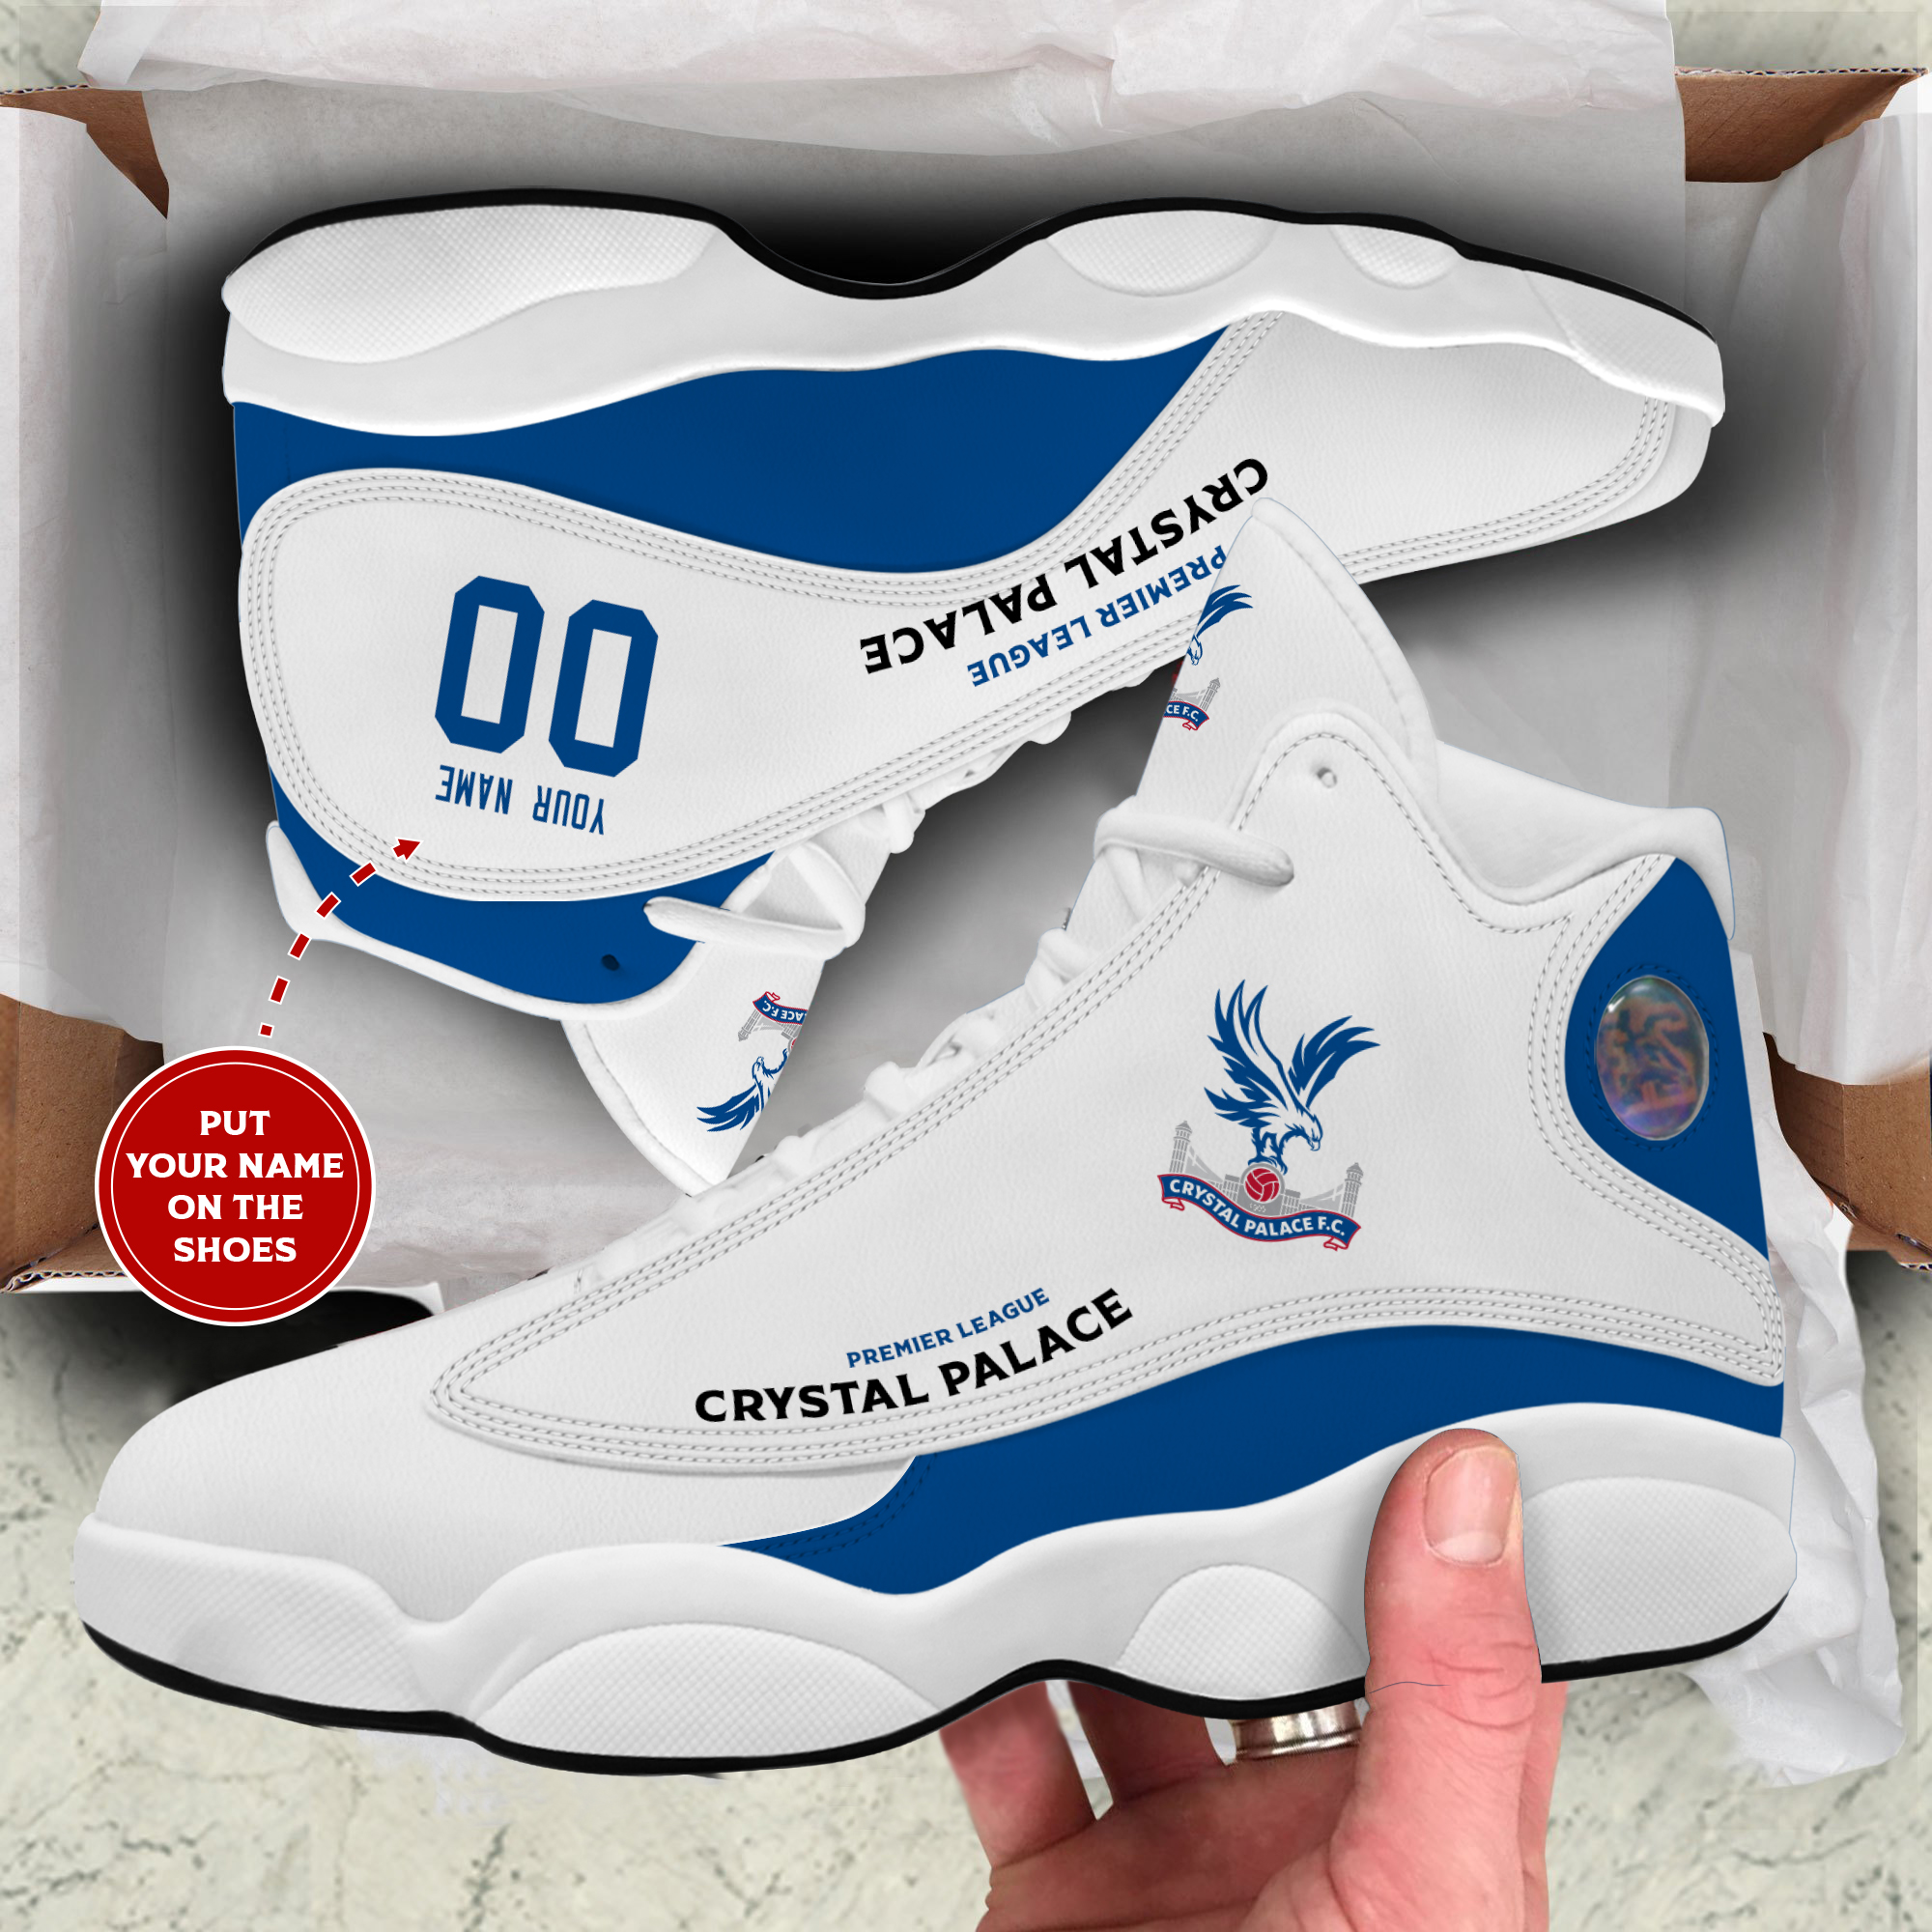 Crystal palace custom air jordan high top shoes 2